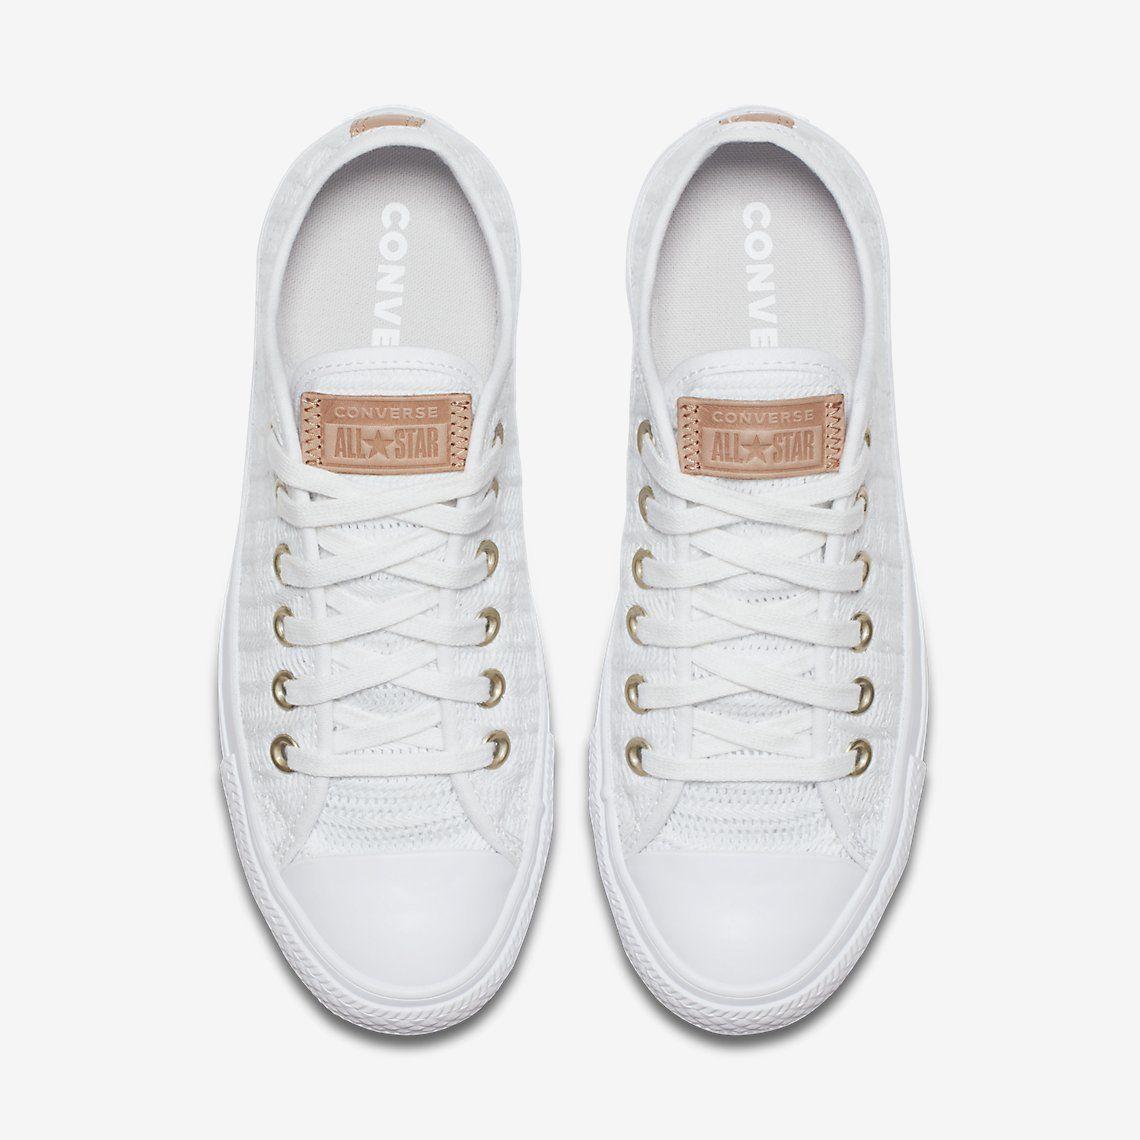 f3dcc5cabb5 Converse Chuck Taylor All Star Herringbone Mesh Low Top Women s Shoe.  Nike.com